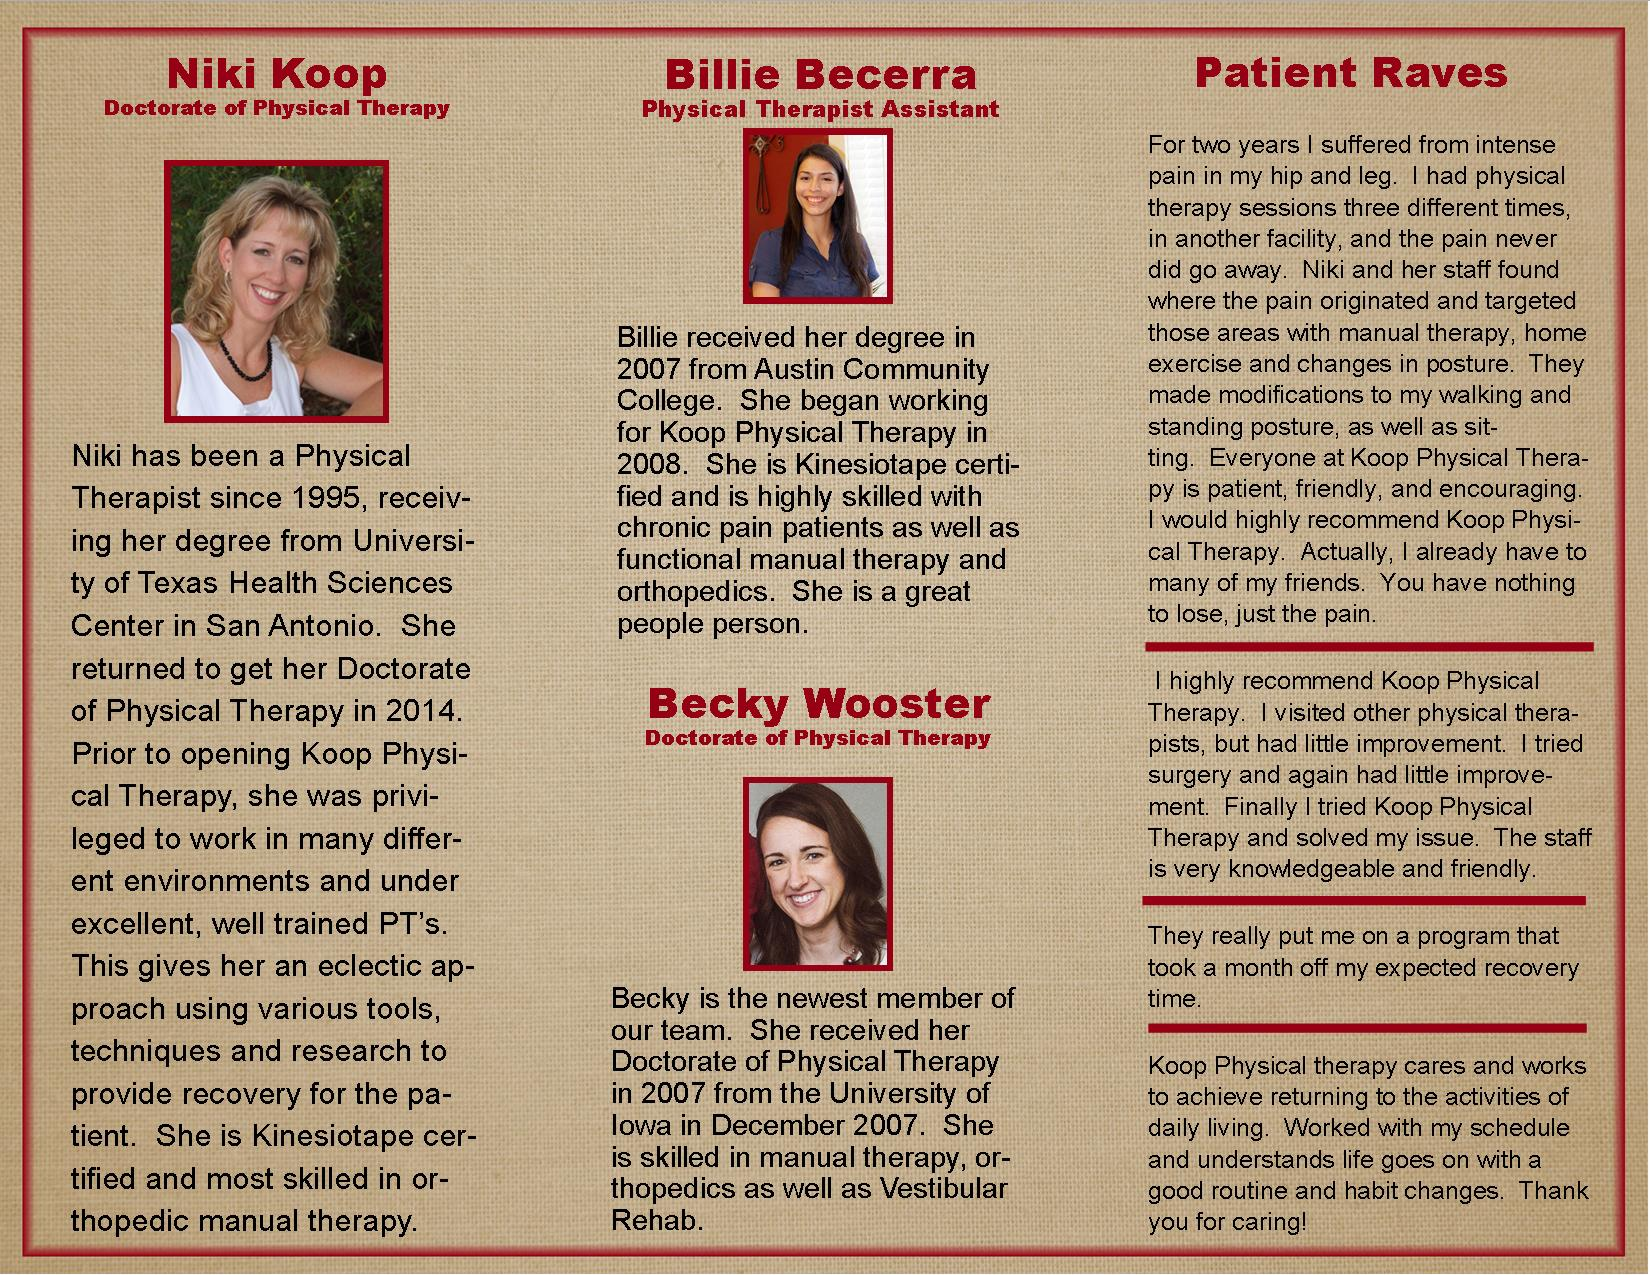 Http://creativedesignstexas.com/images/sample Brochures/kooppt Brochure  Inside